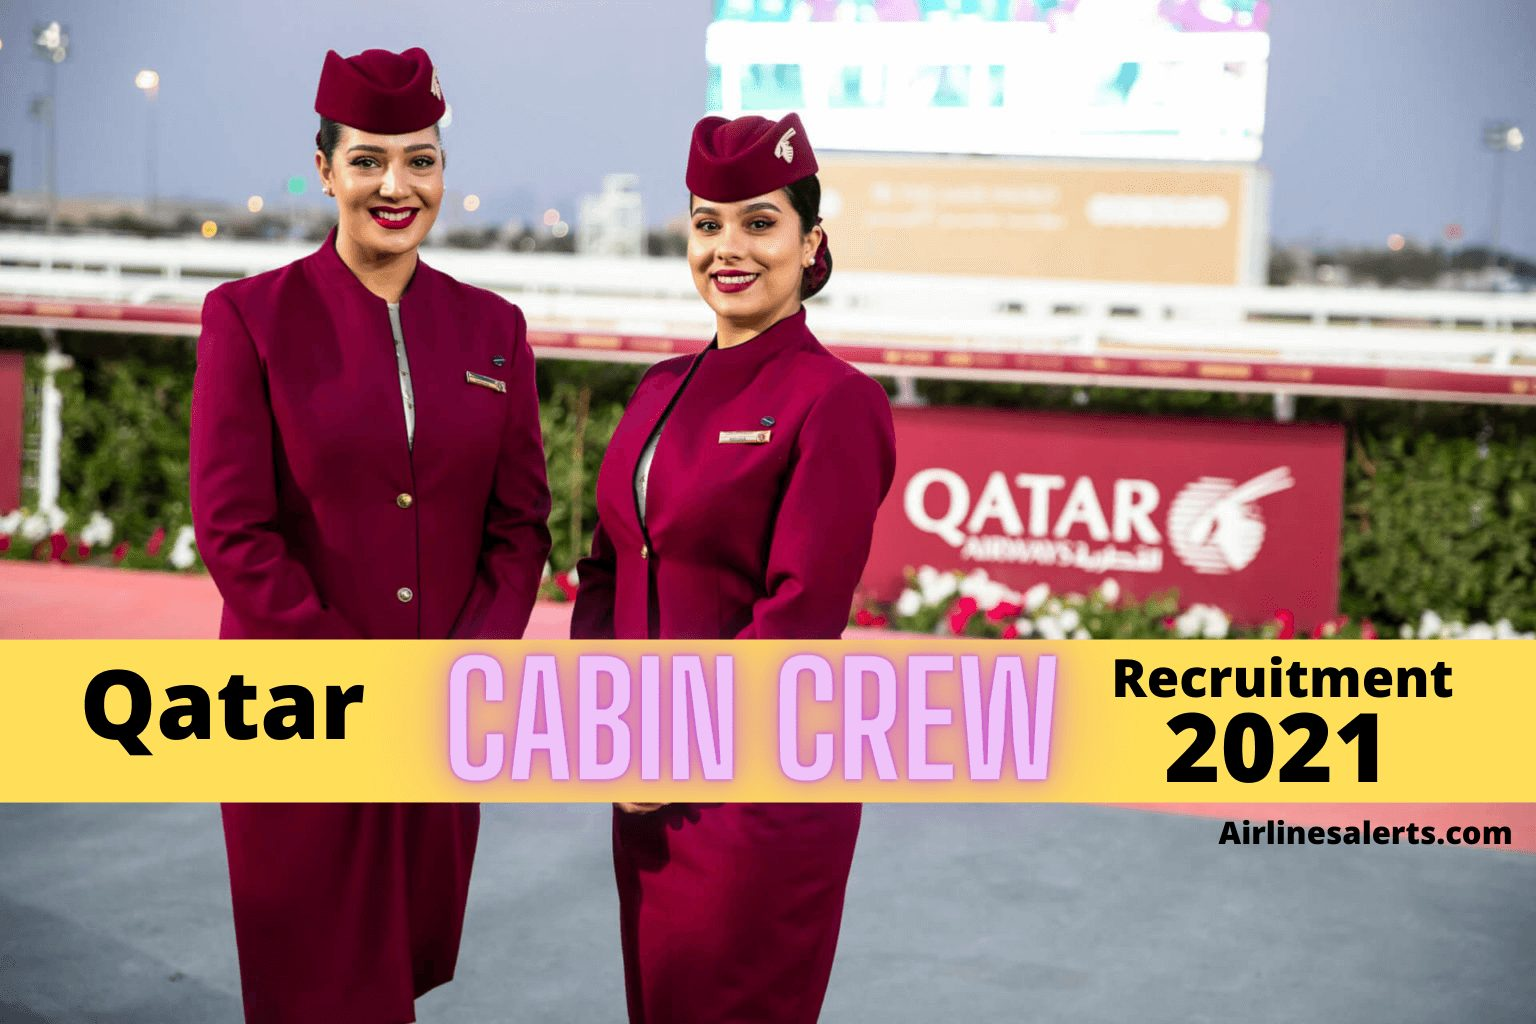 Qatar Airways Cabin Crew Recruitment Portugal 2021 - Read Details & Apply